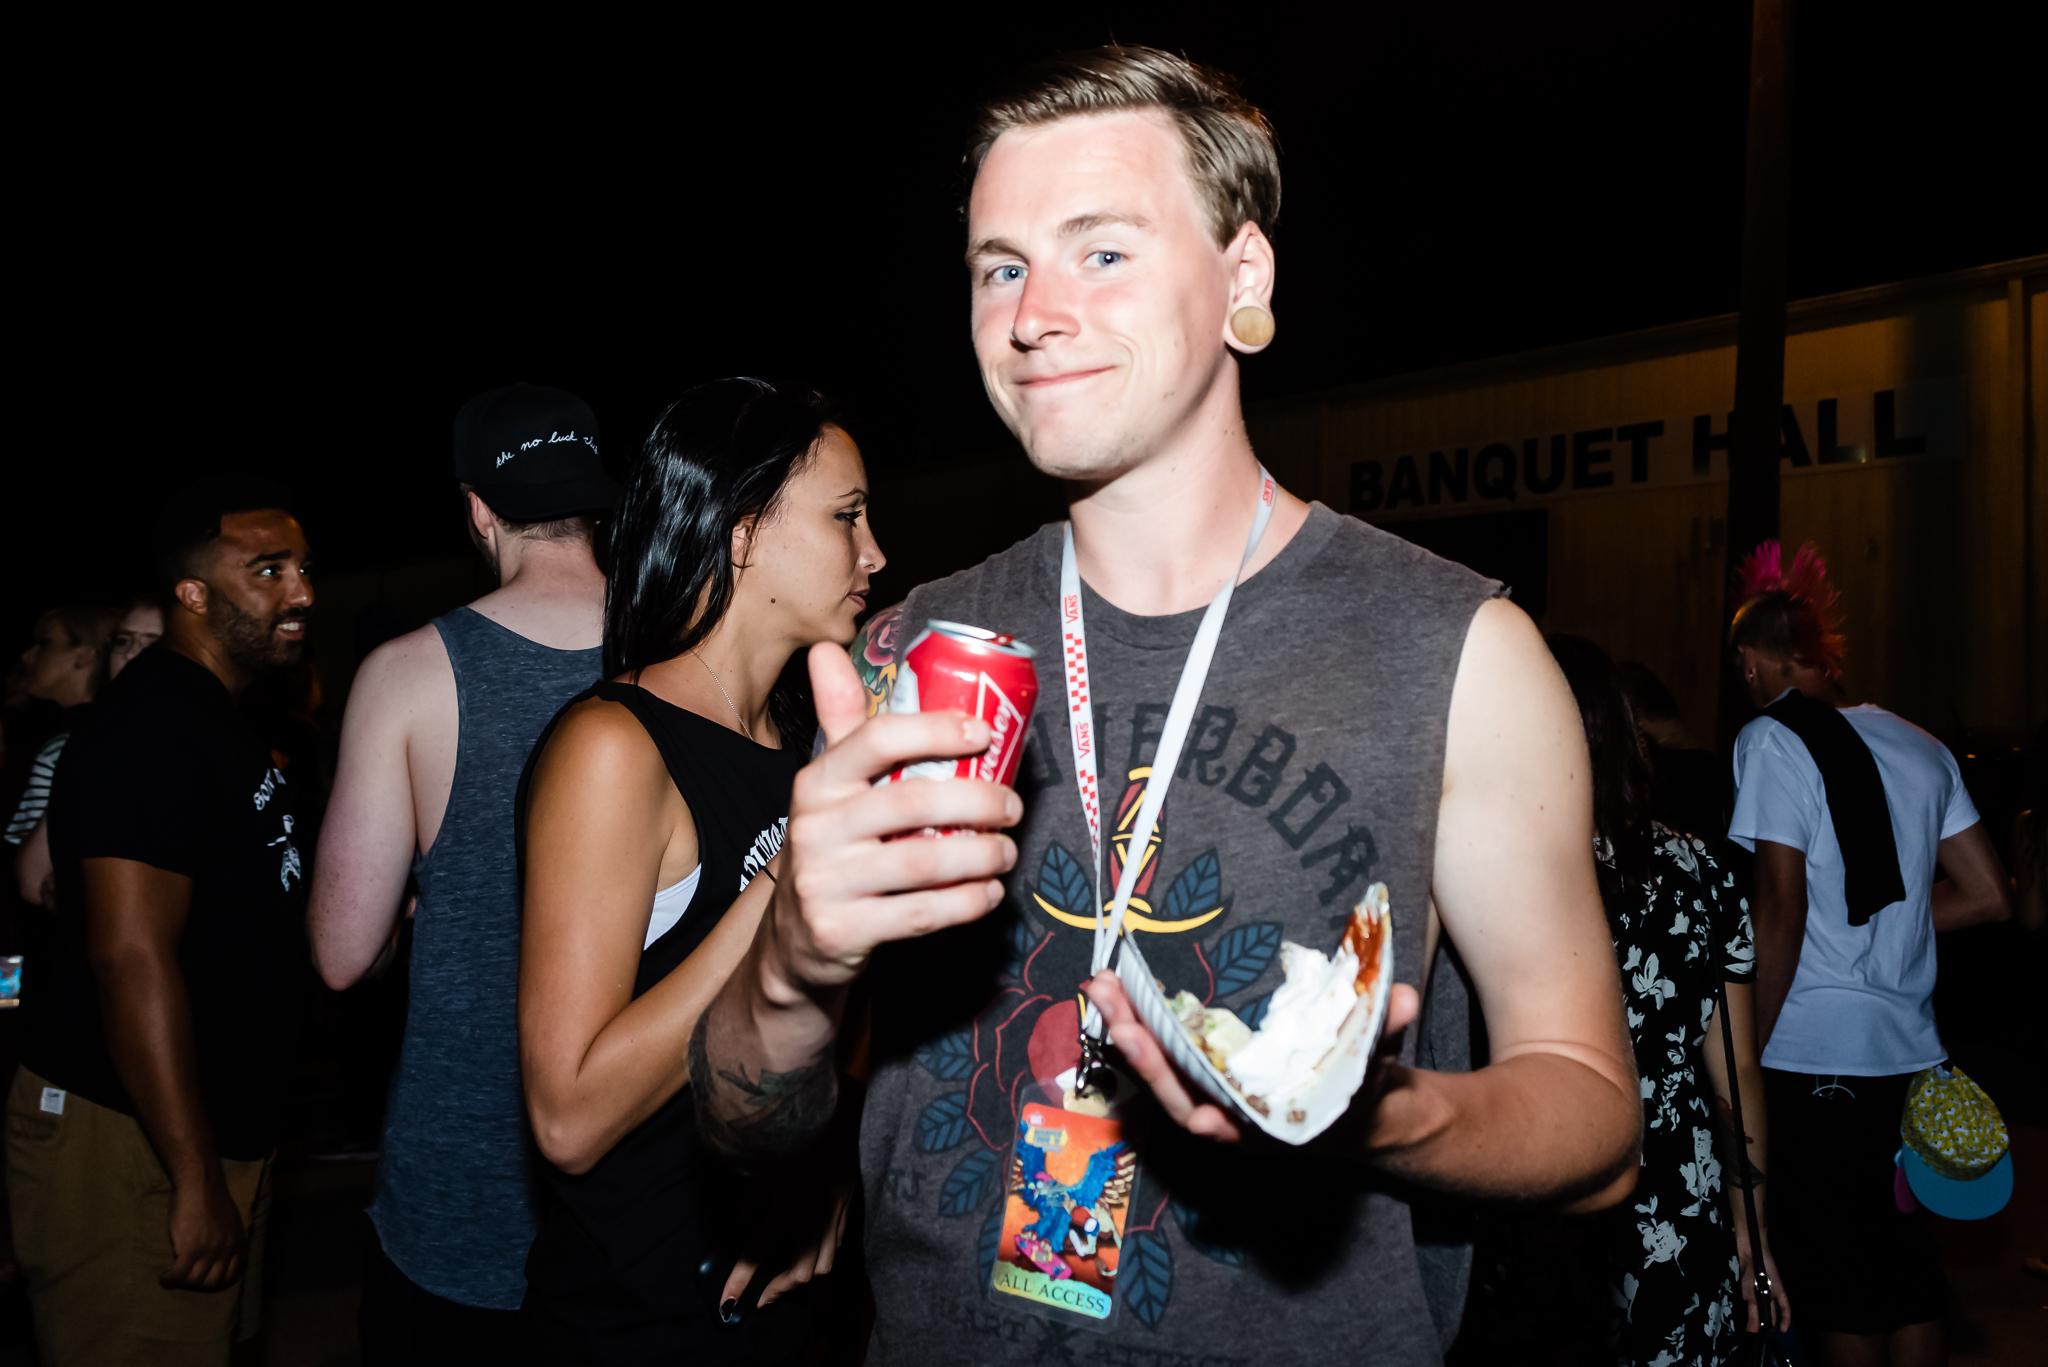 Luke of Like Pacific / 6/29/16 / Vans Warped Tour / Nashville, TN